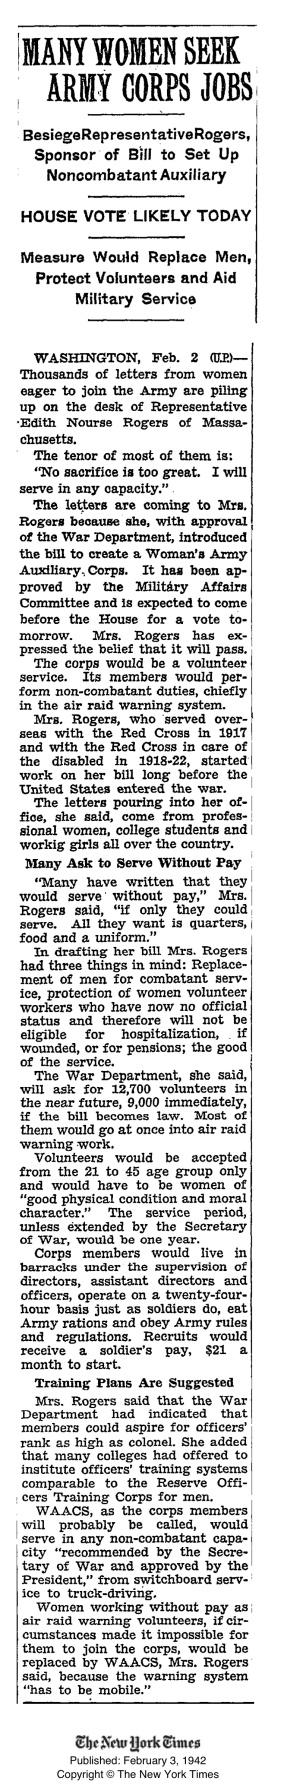 1942_EdithNourseRogers_WomenArmyCorps_NYT85221579